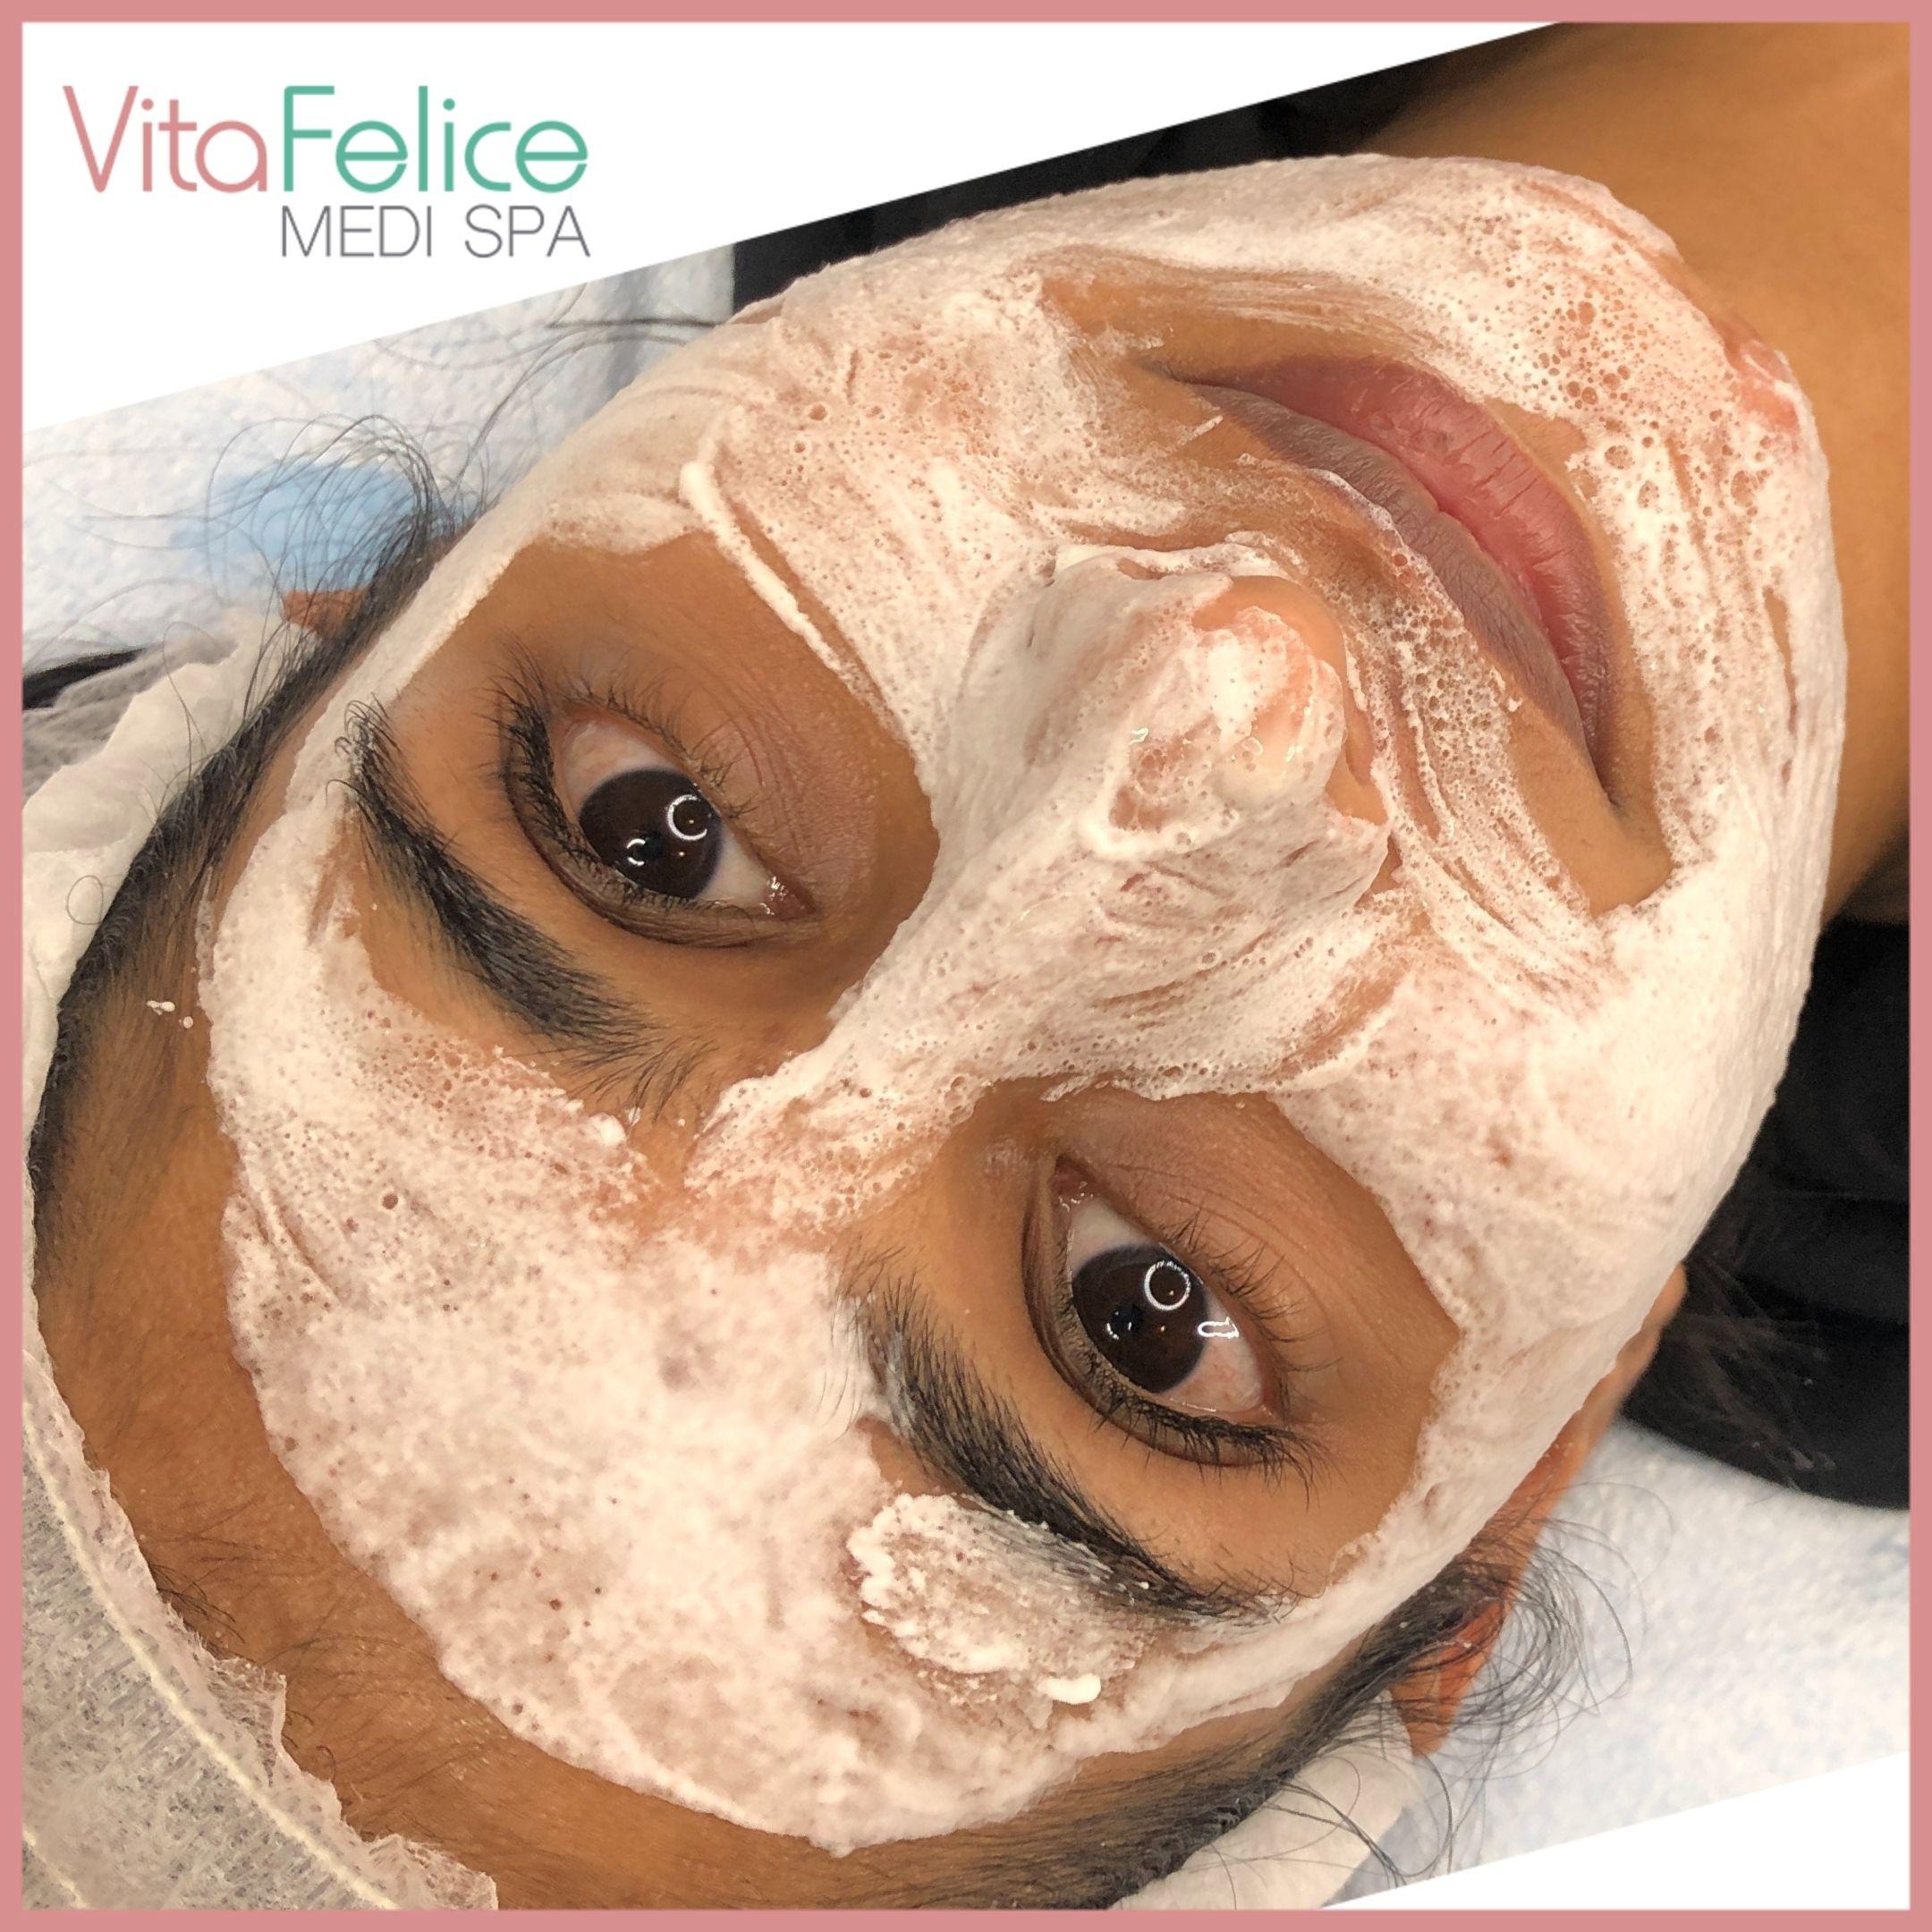 Oxygen Mask at Vita Felice near Surrey